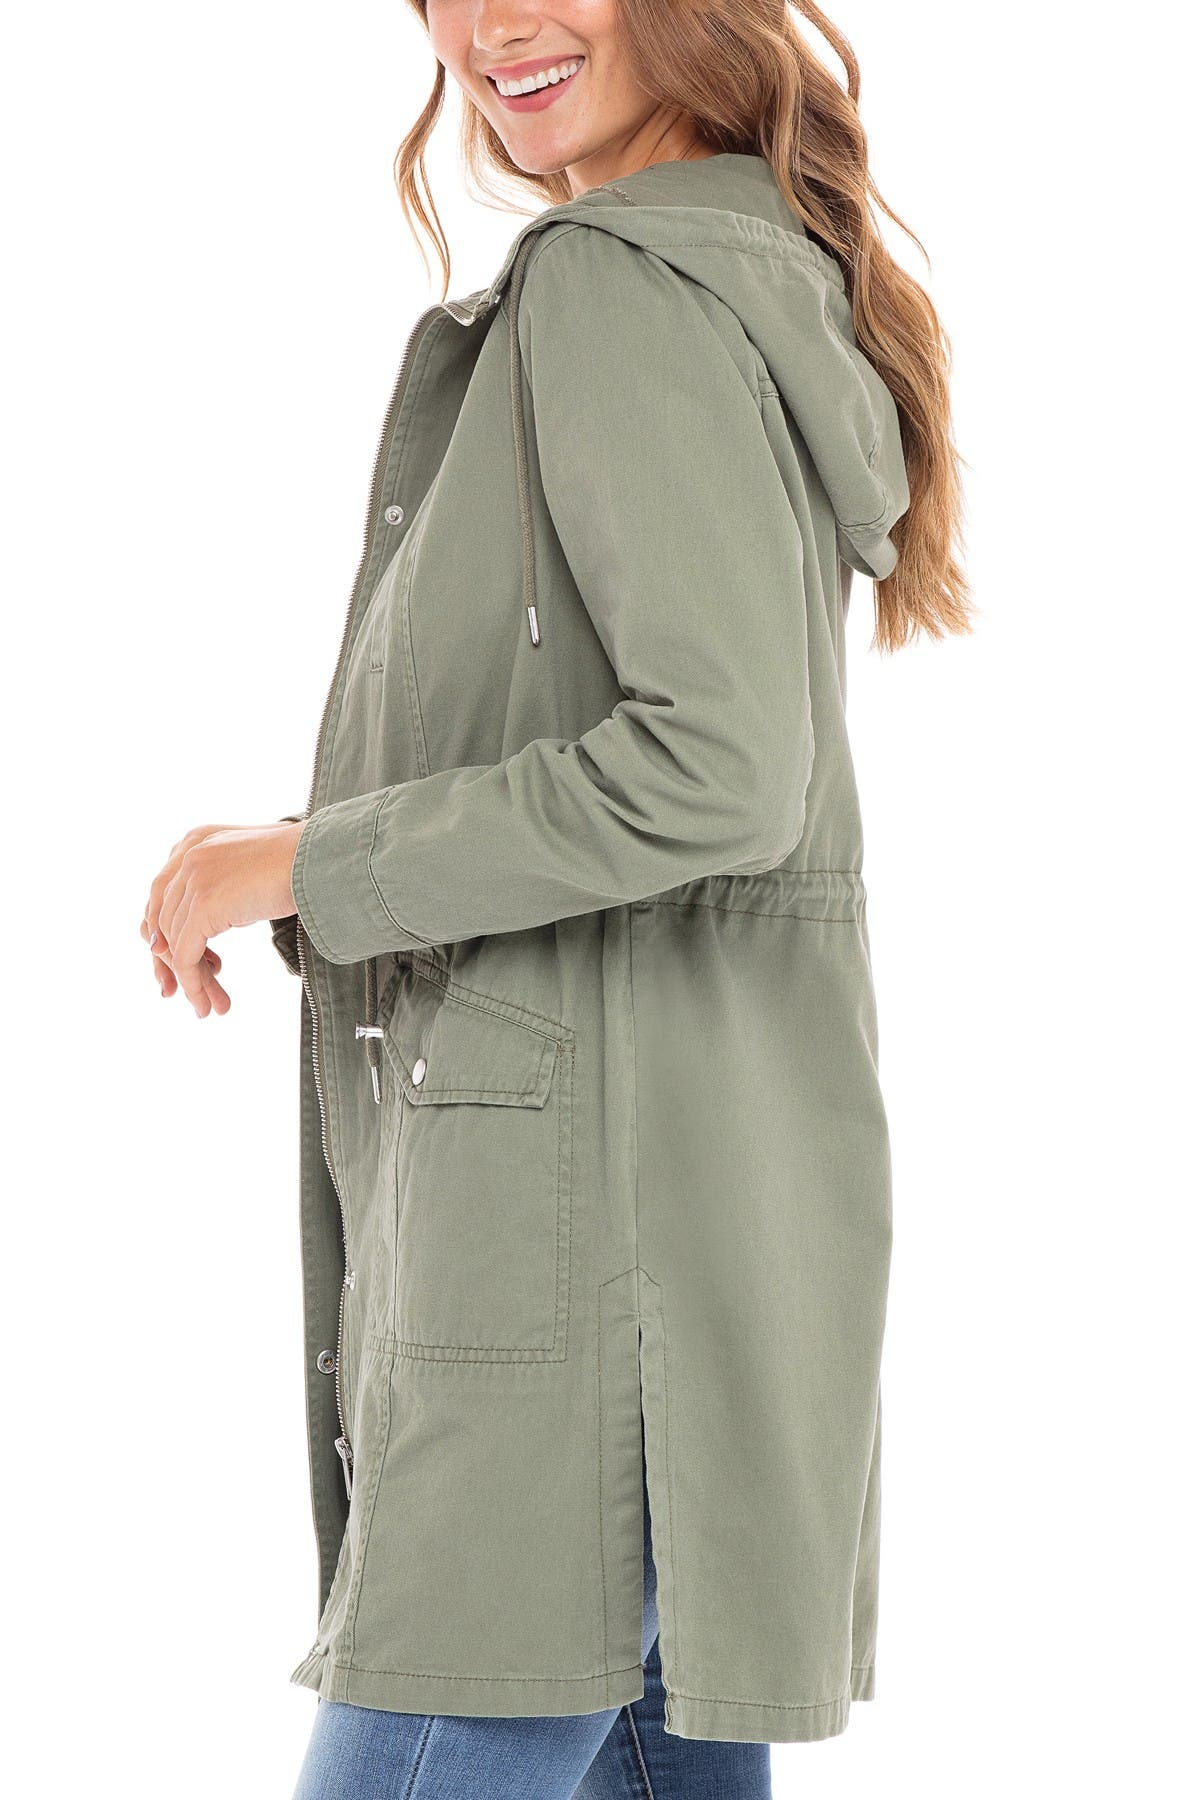 Sebby Mid Length Twill Utility Jacket